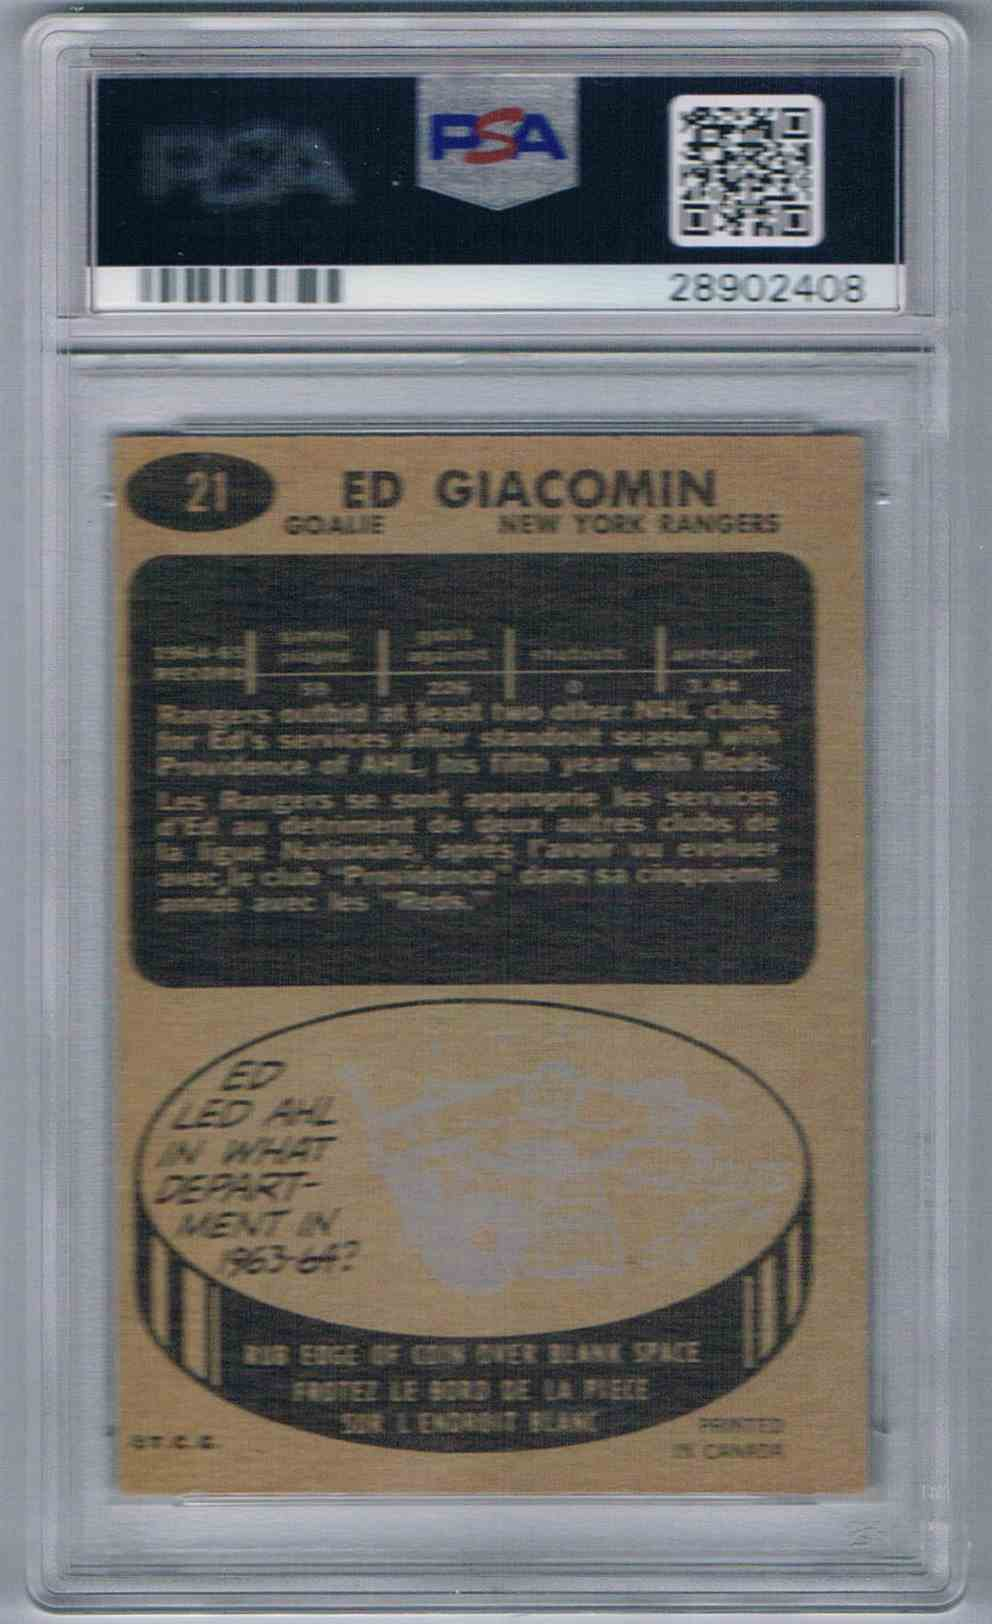 1965-66 Topps Bad Grade More Like 6 Ed Giacomin #21 card back image